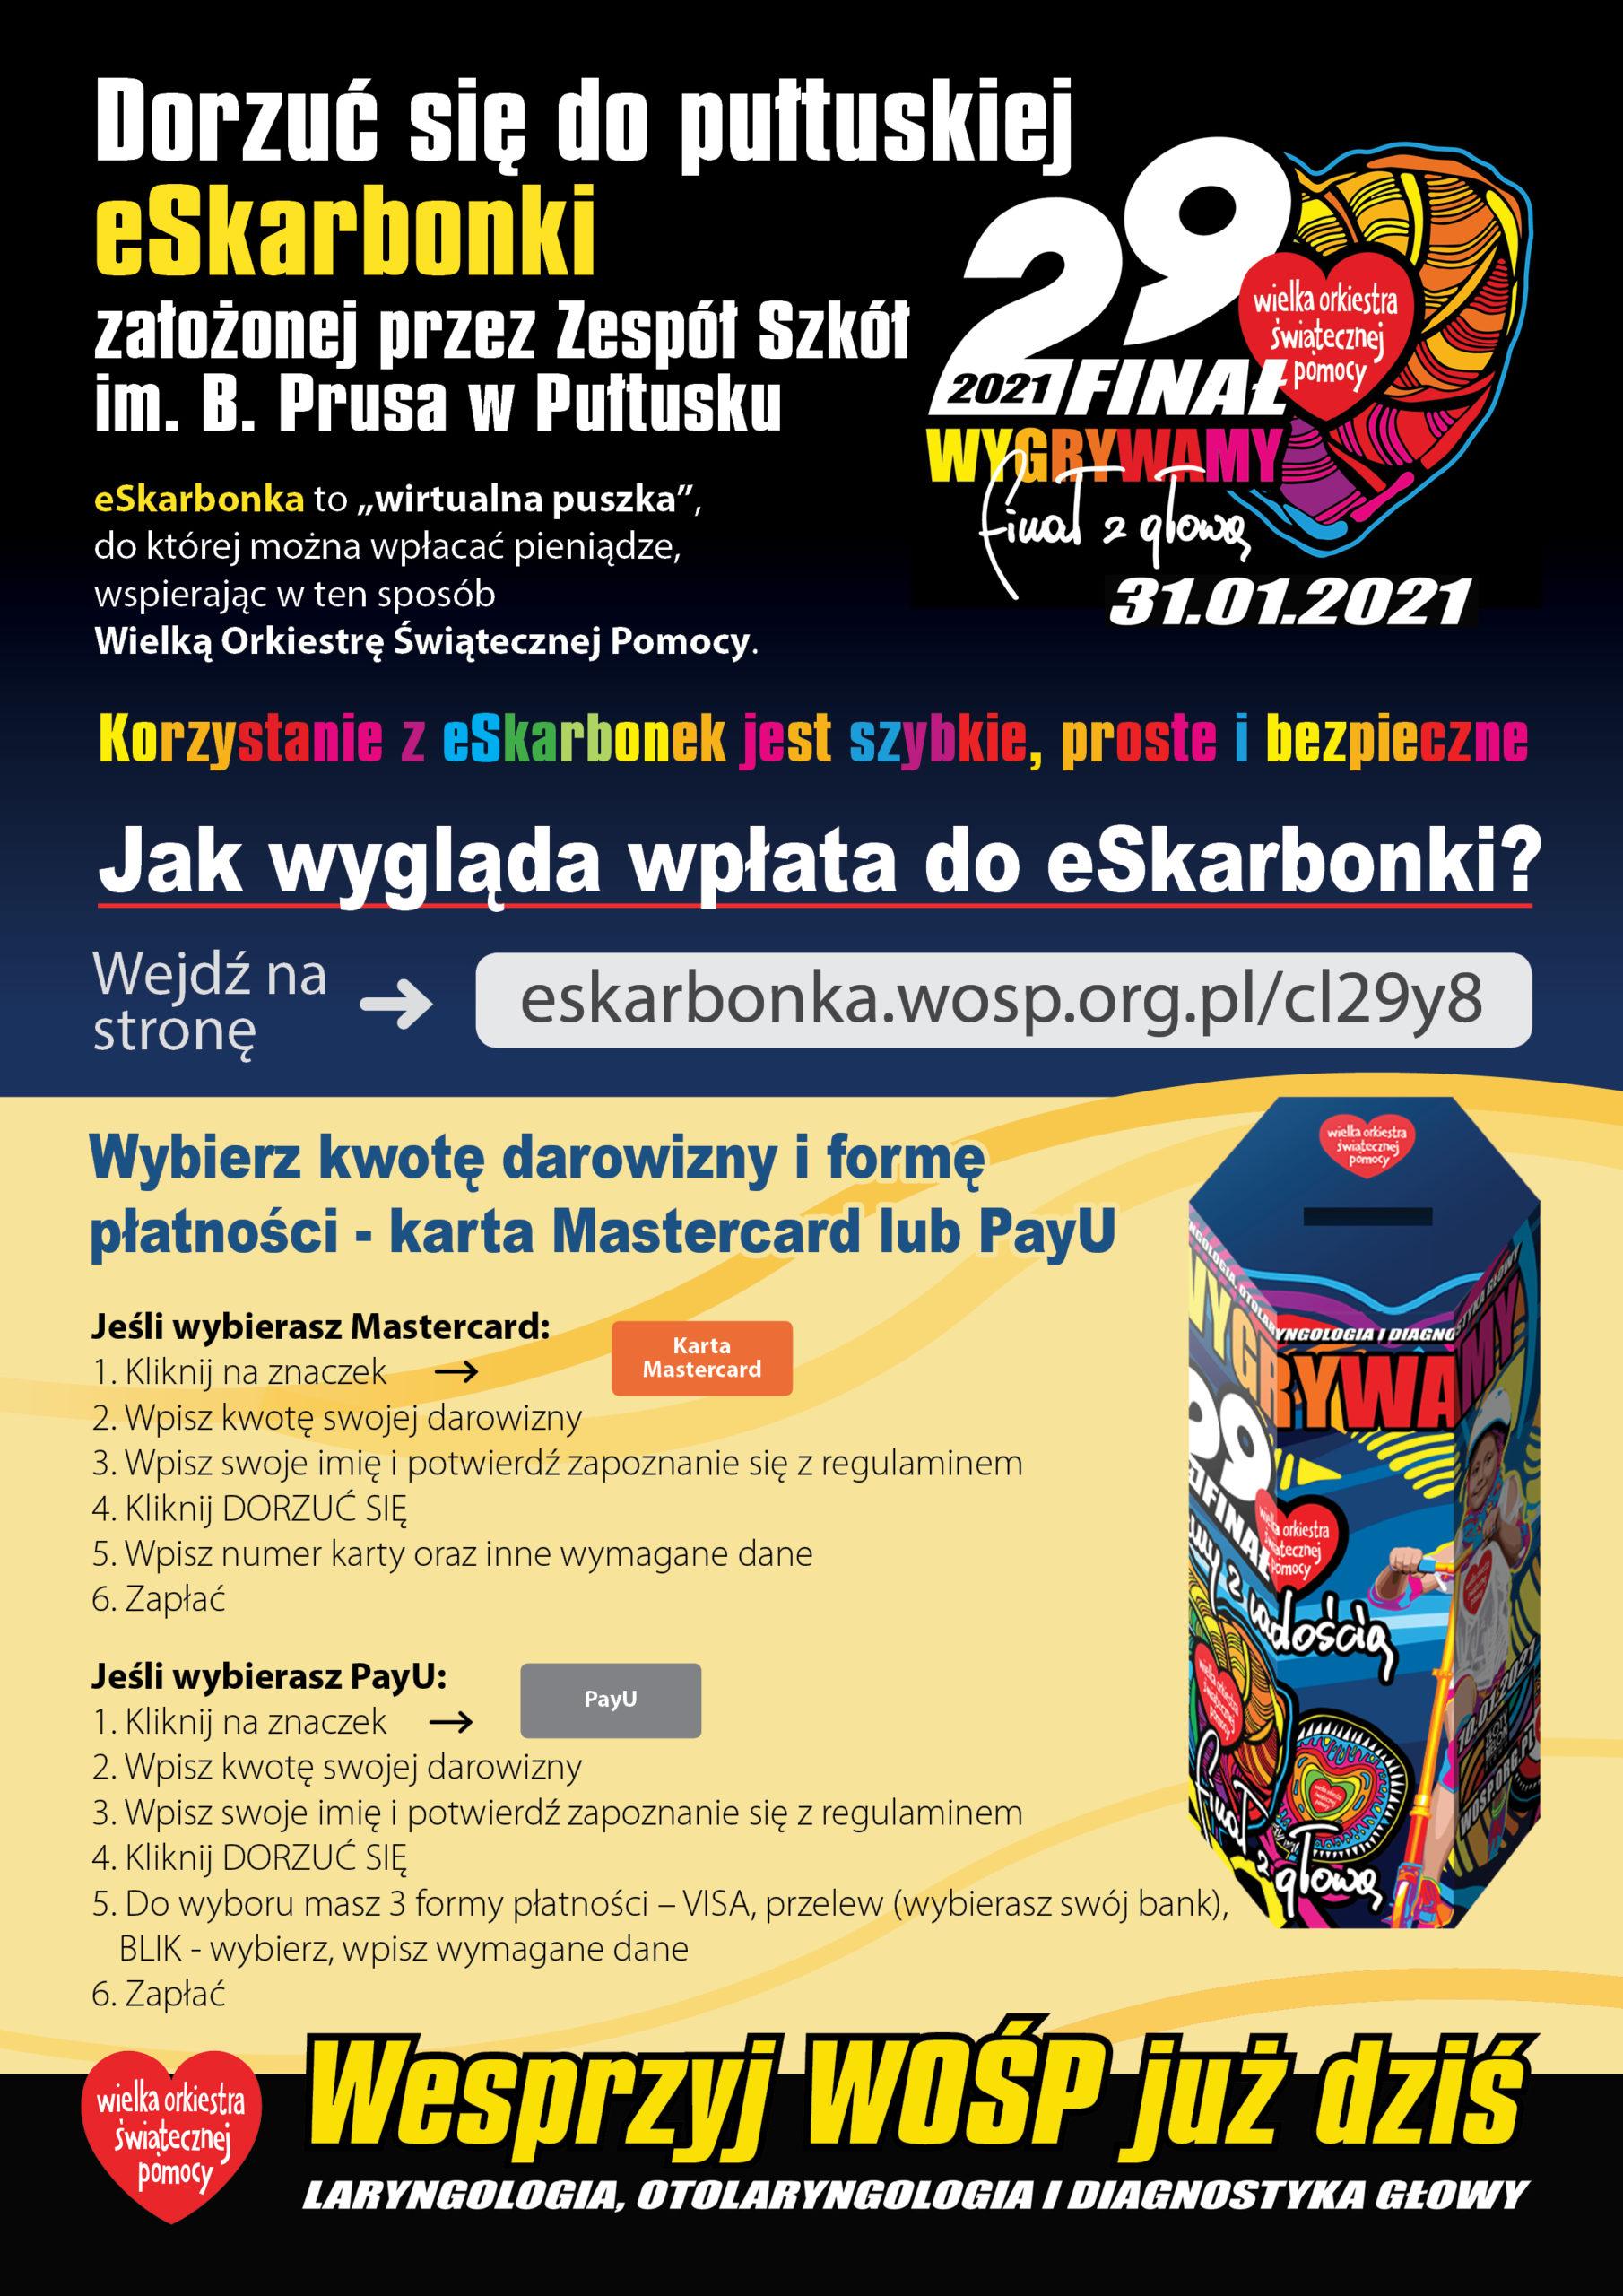 29. finał WOŚP – pułtuska e-Skarbonka